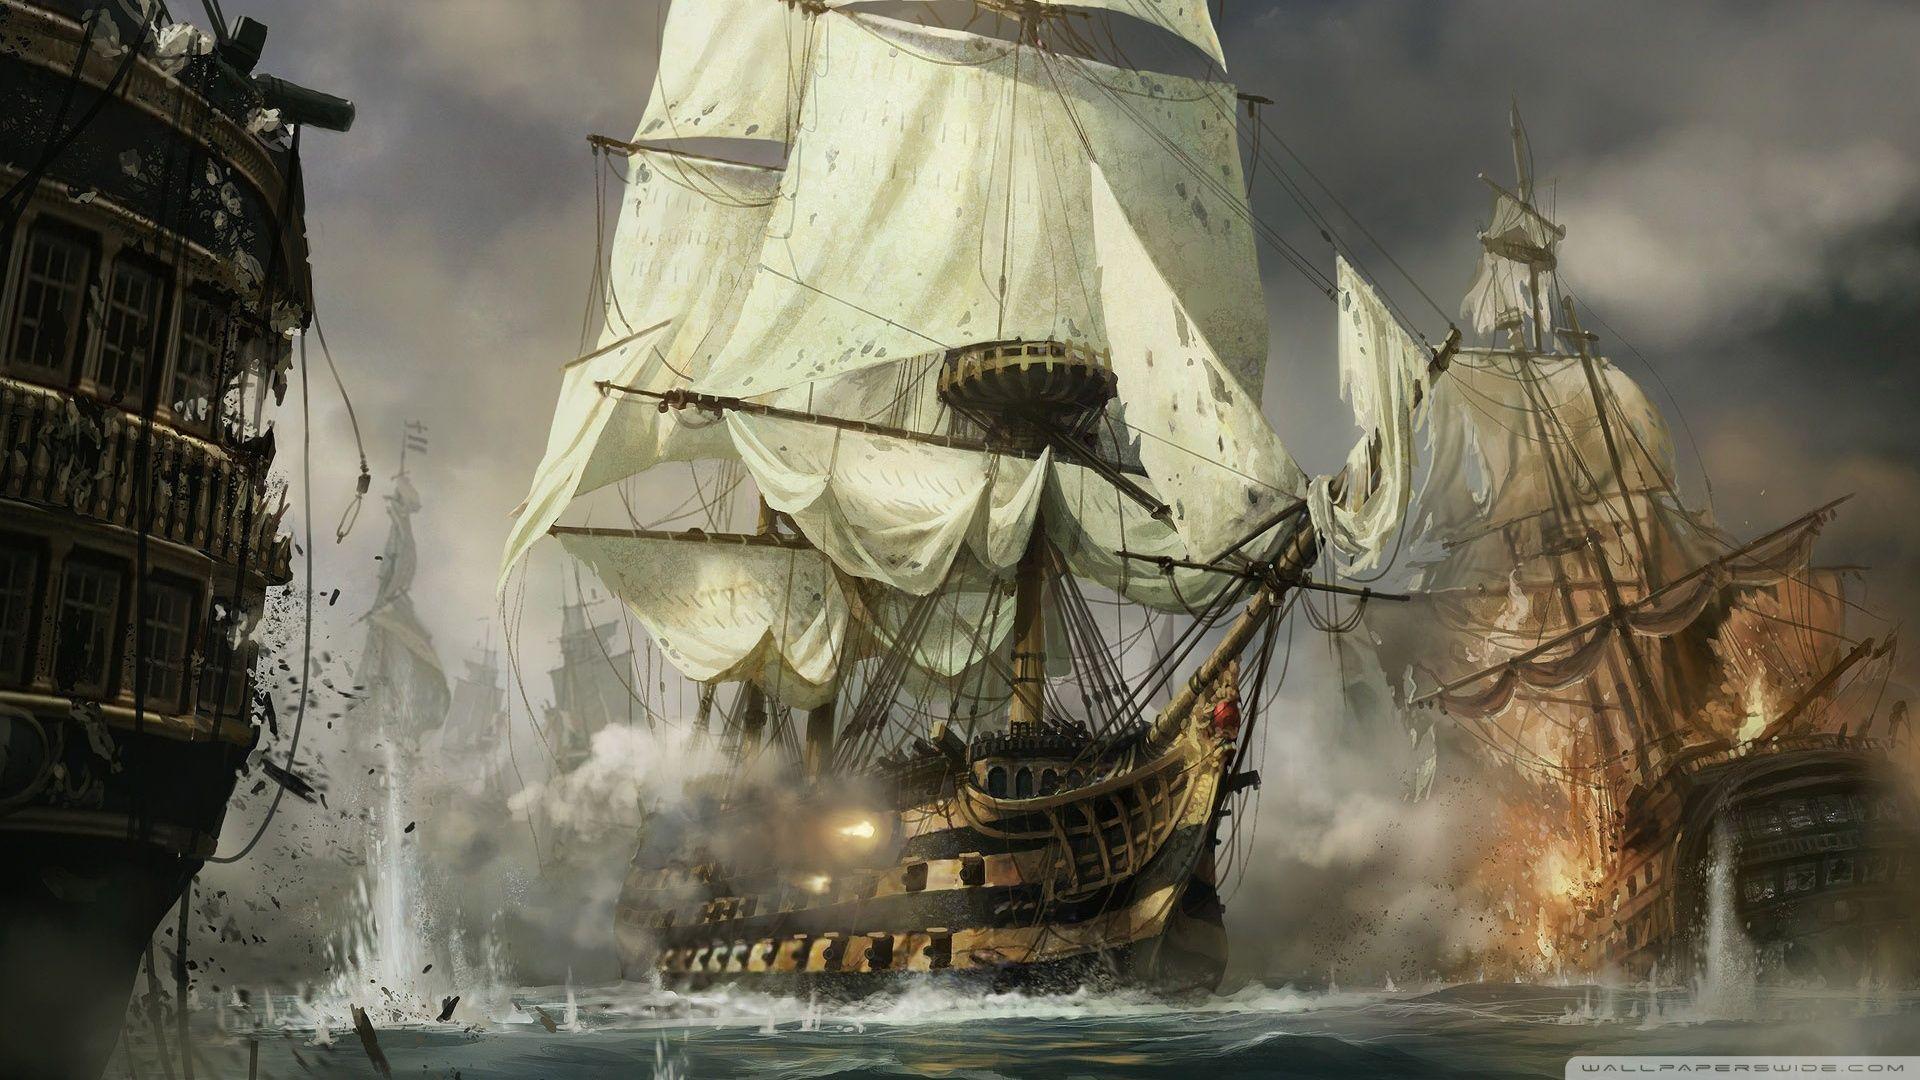 Age Of Empires Concept Art HD desktop wallpaper : High Definition ...